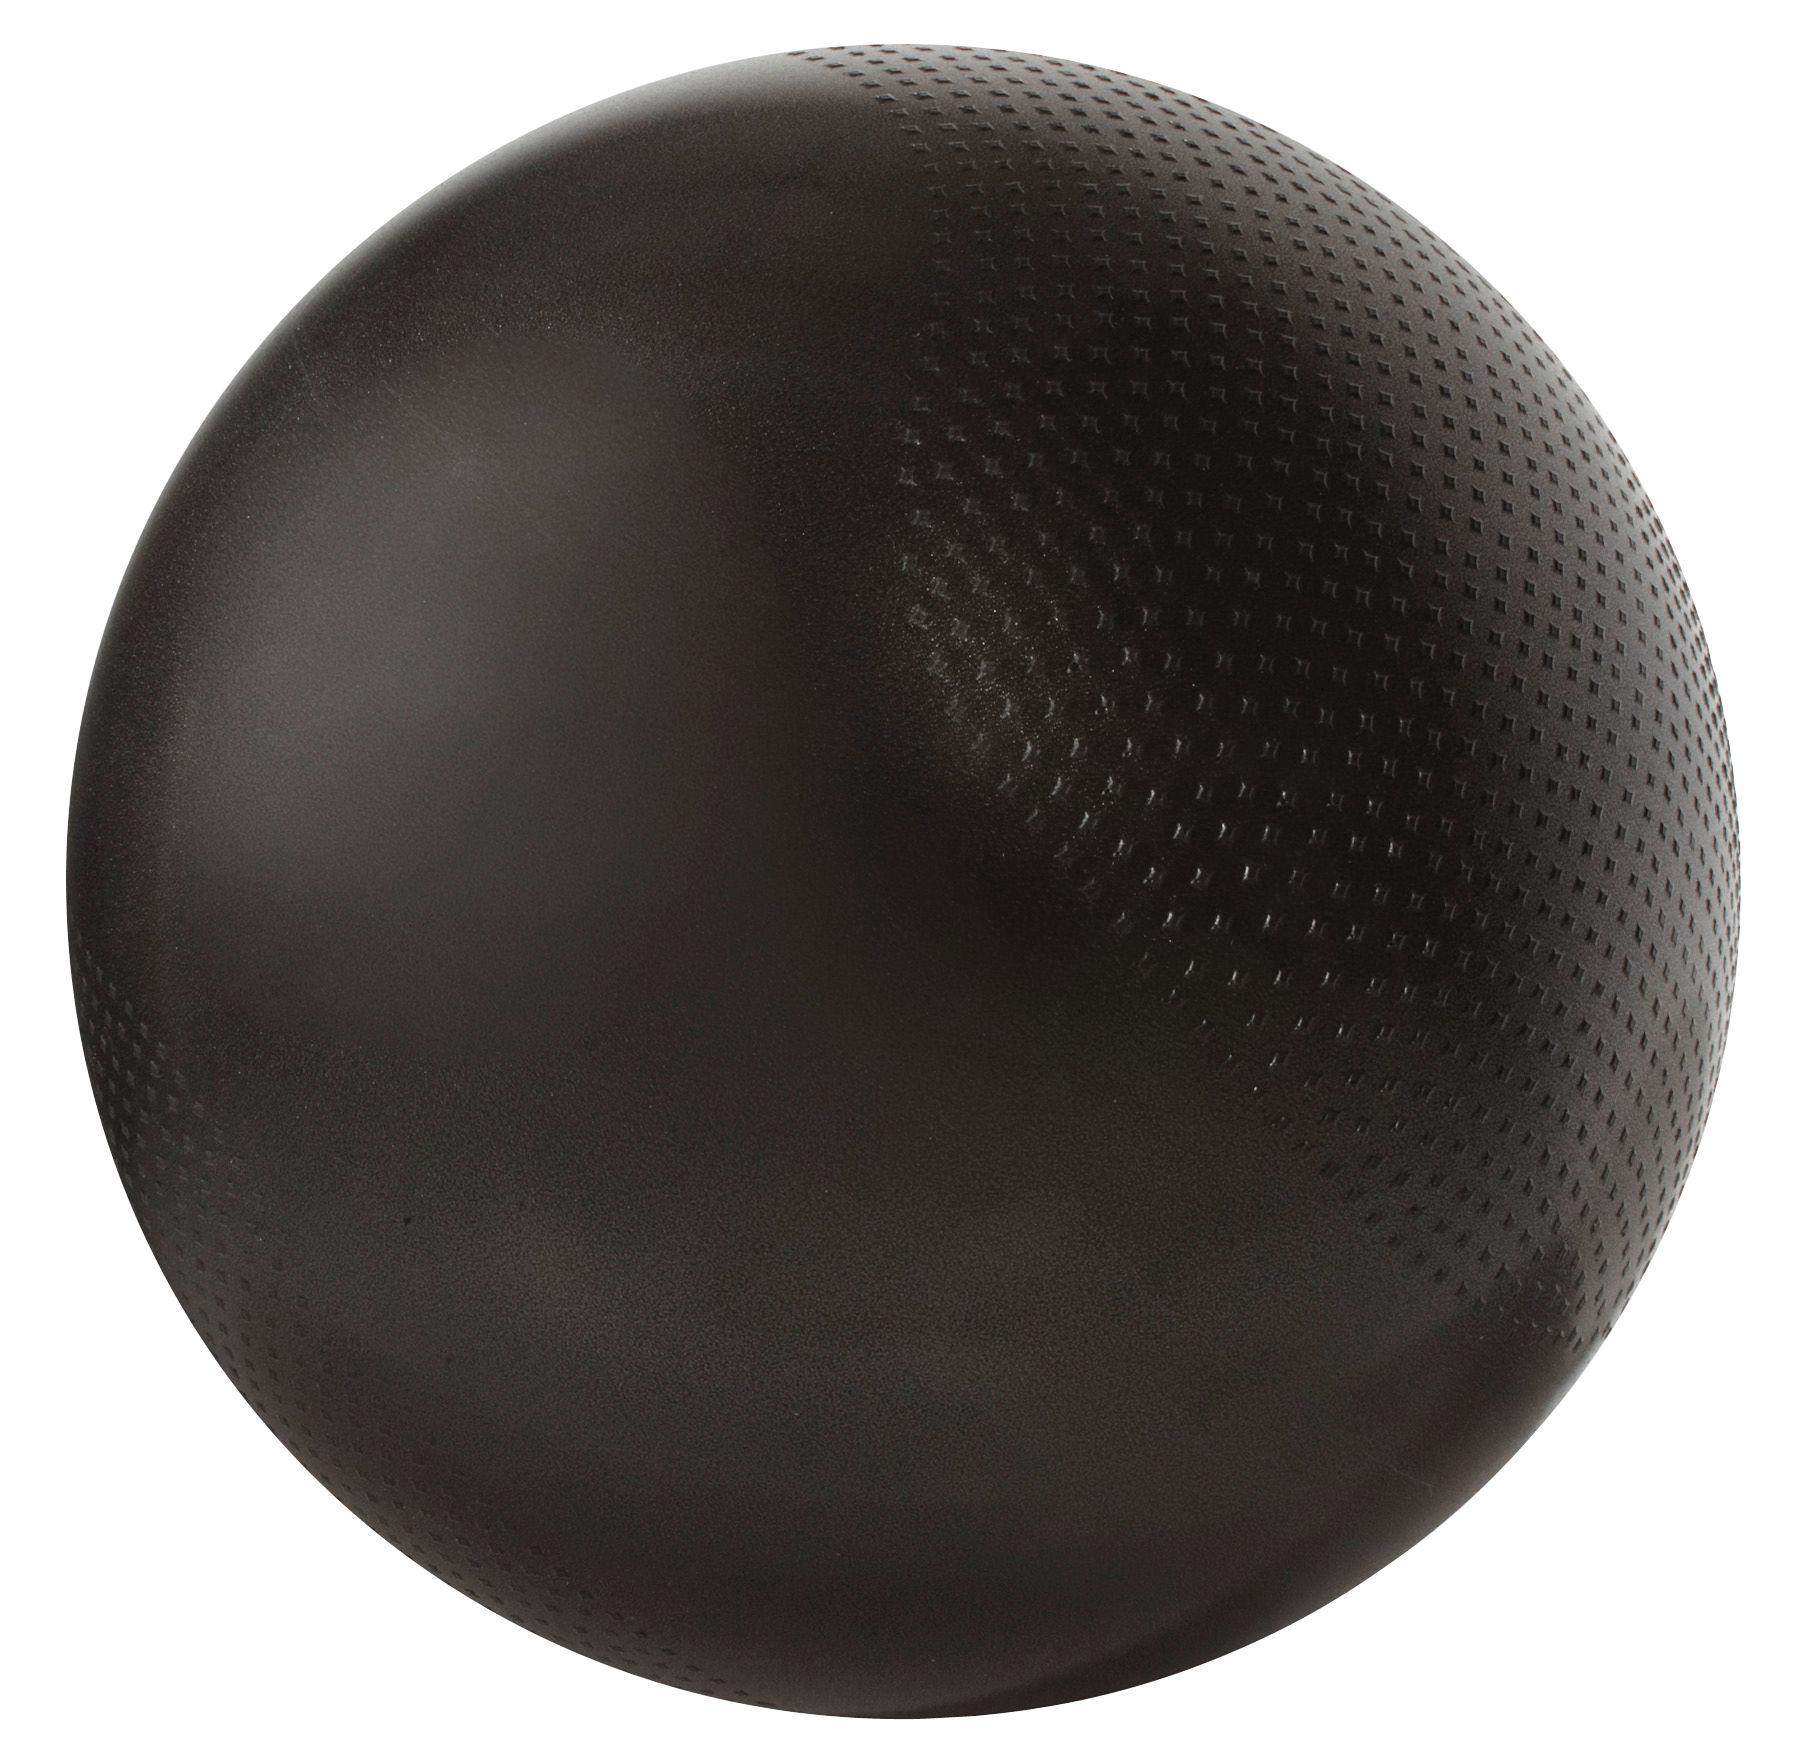 Exercise Balls & Stability Balls